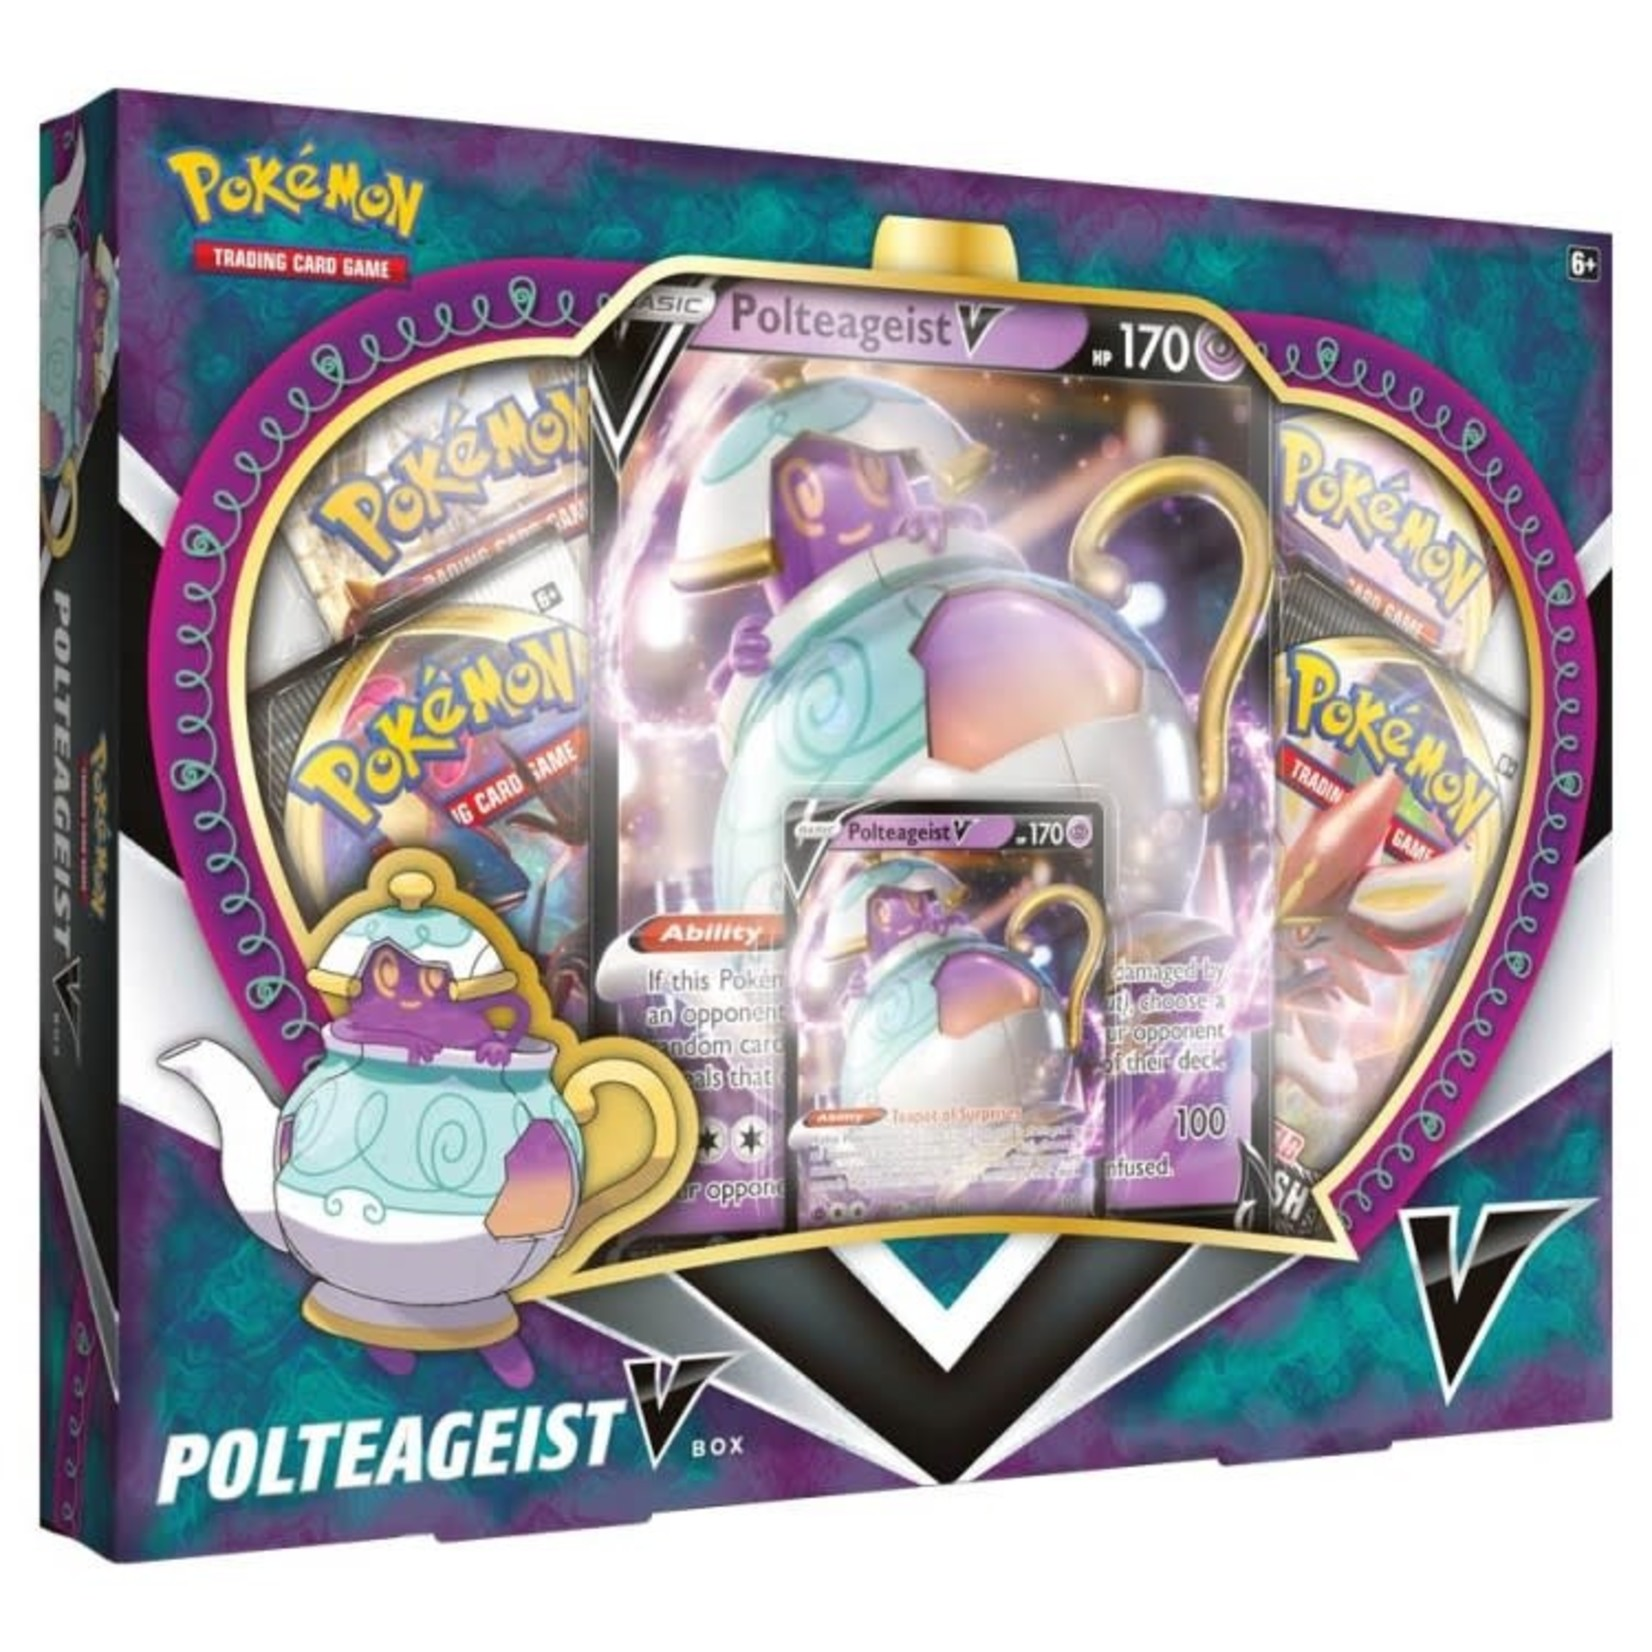 Pokemon International Pokemon Polteageist V Box